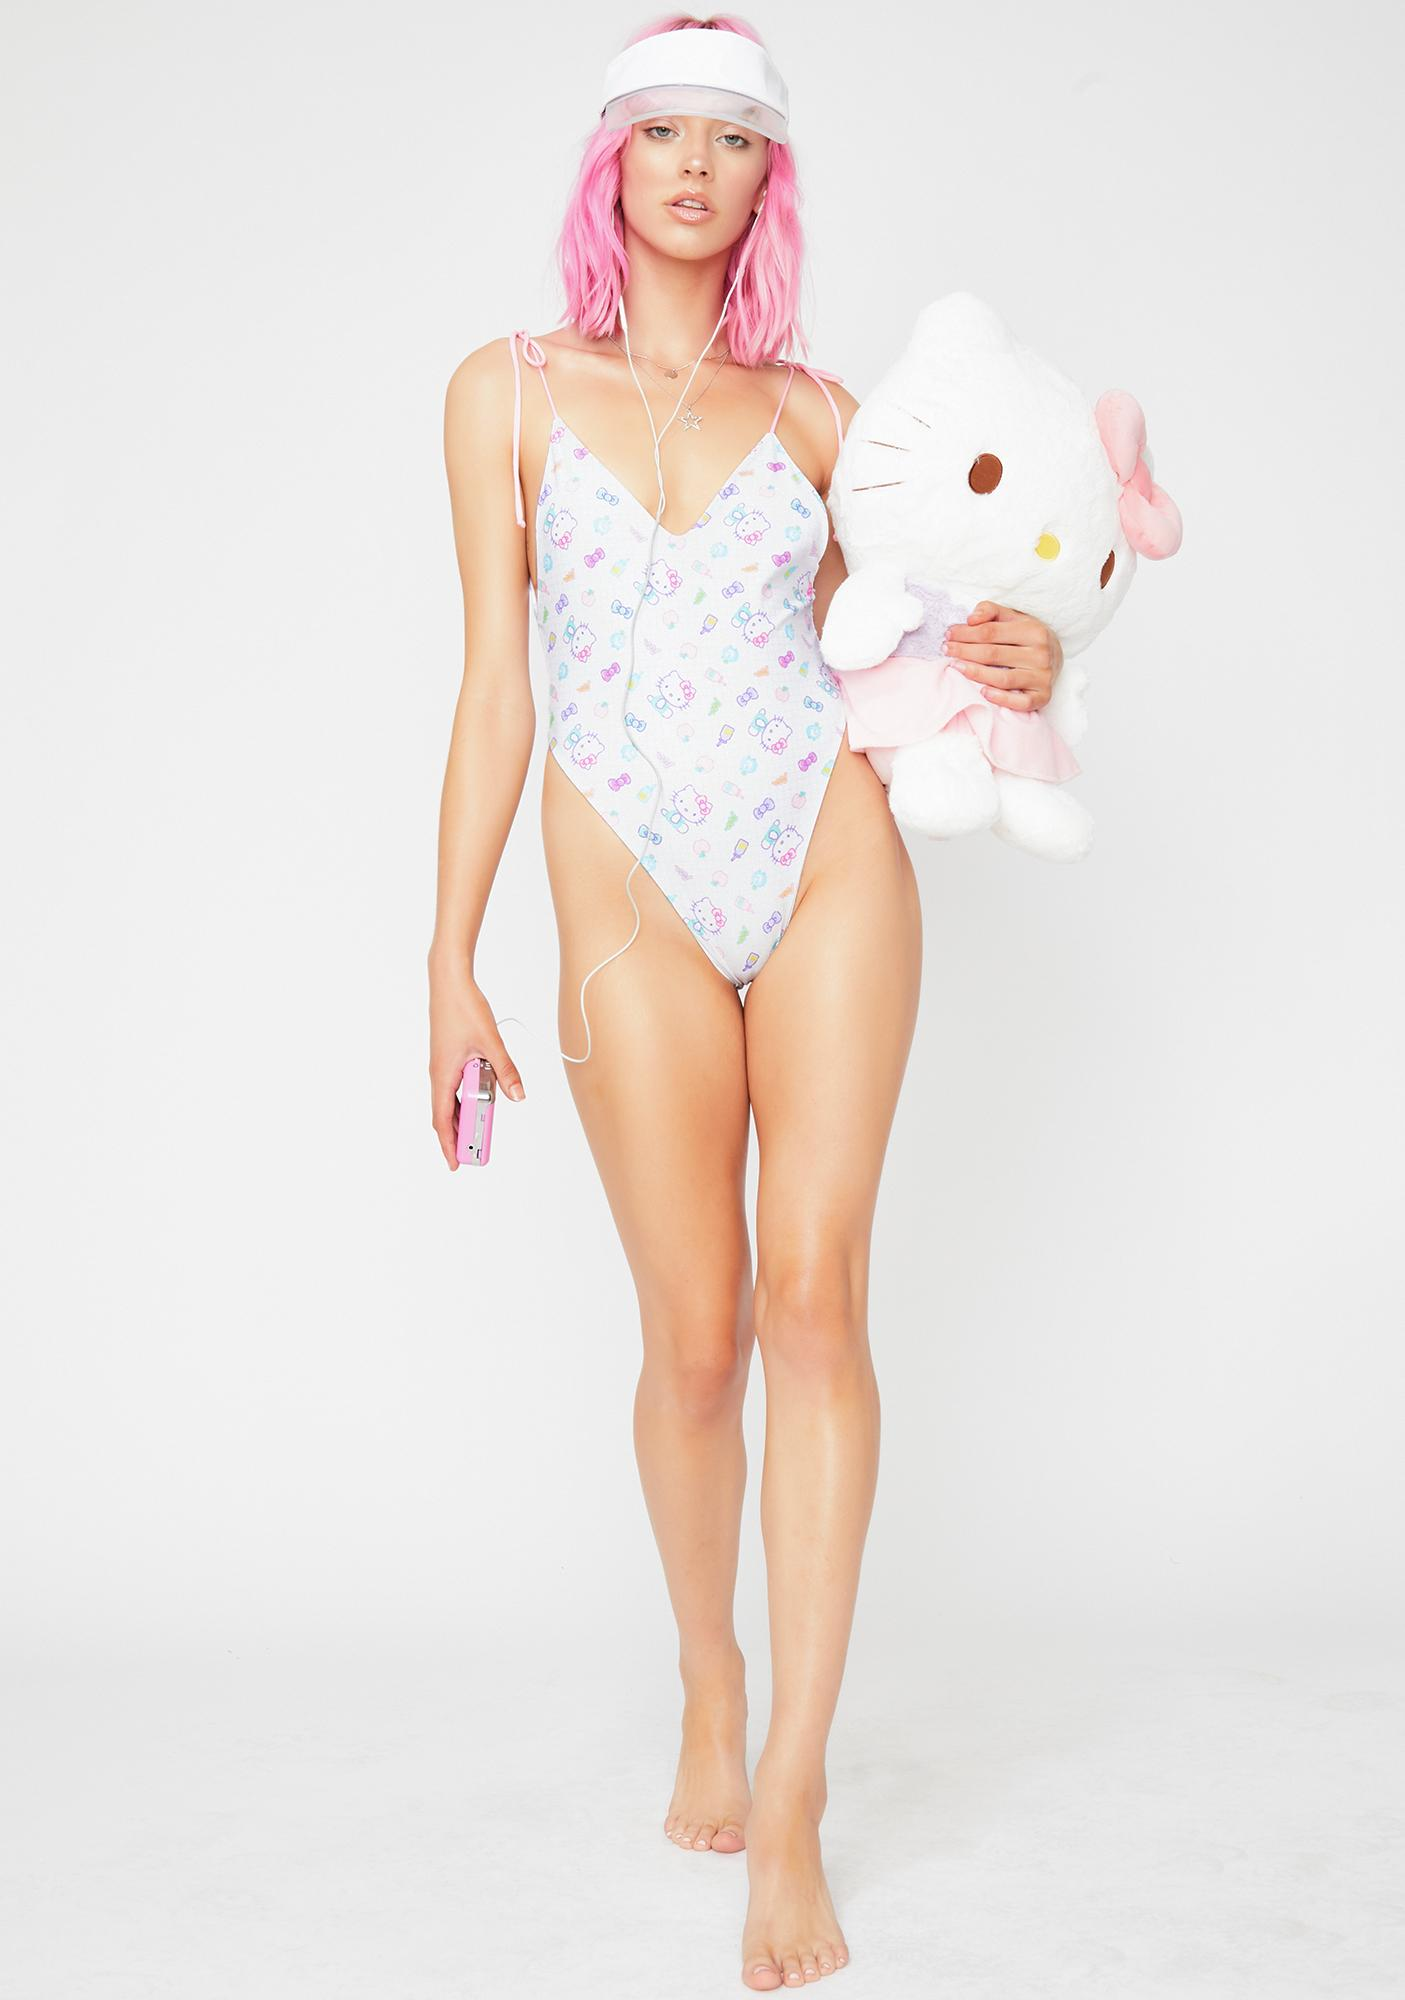 Lolli Swim x Hello Kitty Pink Promise One Piece Swimsuit